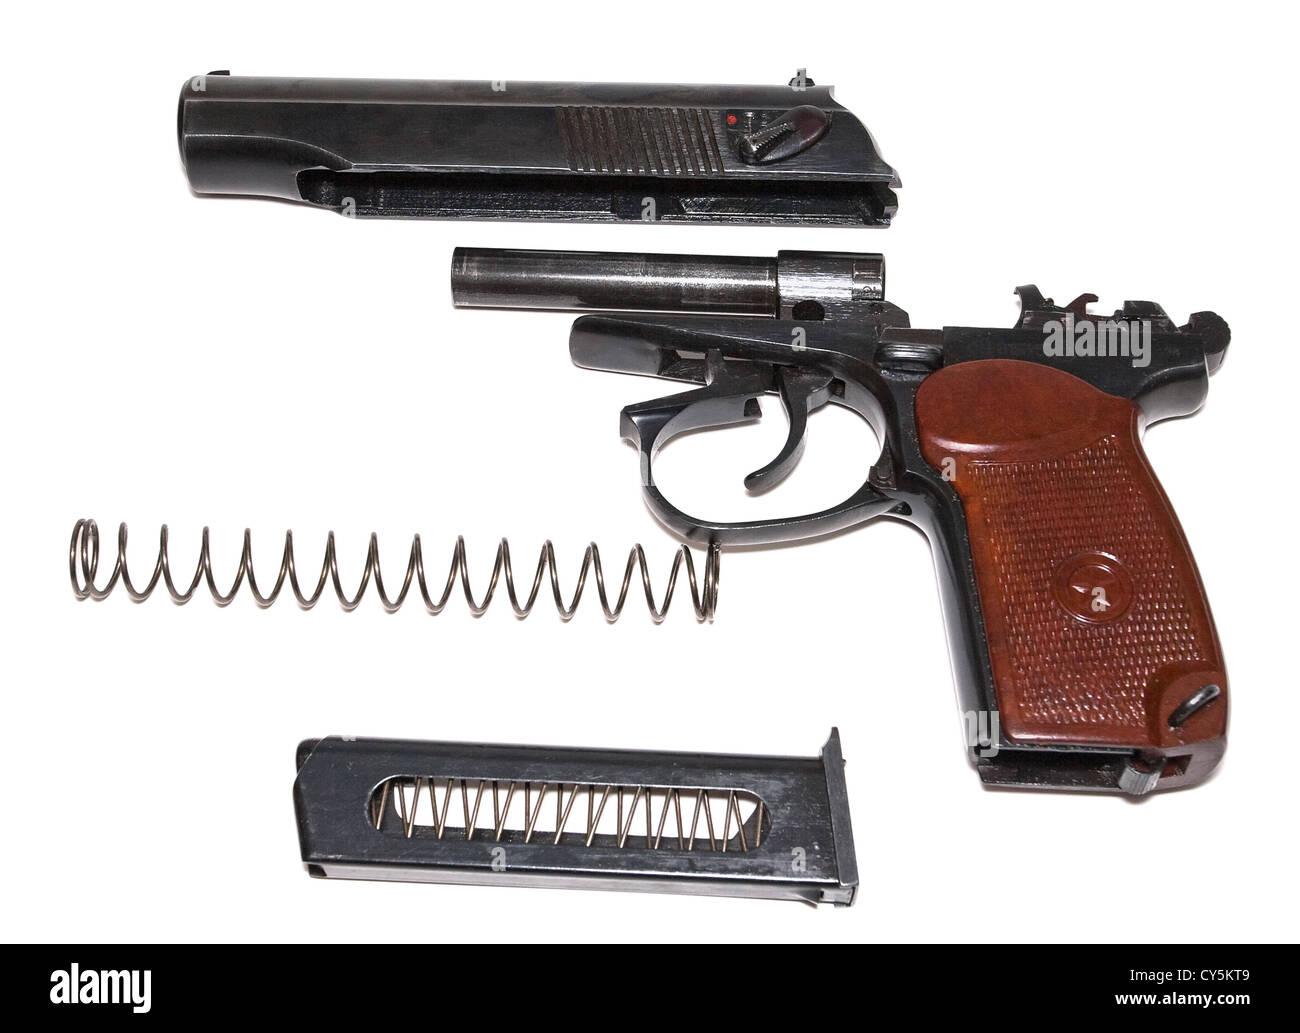 Disassembled handgun on a white background - Stock Image